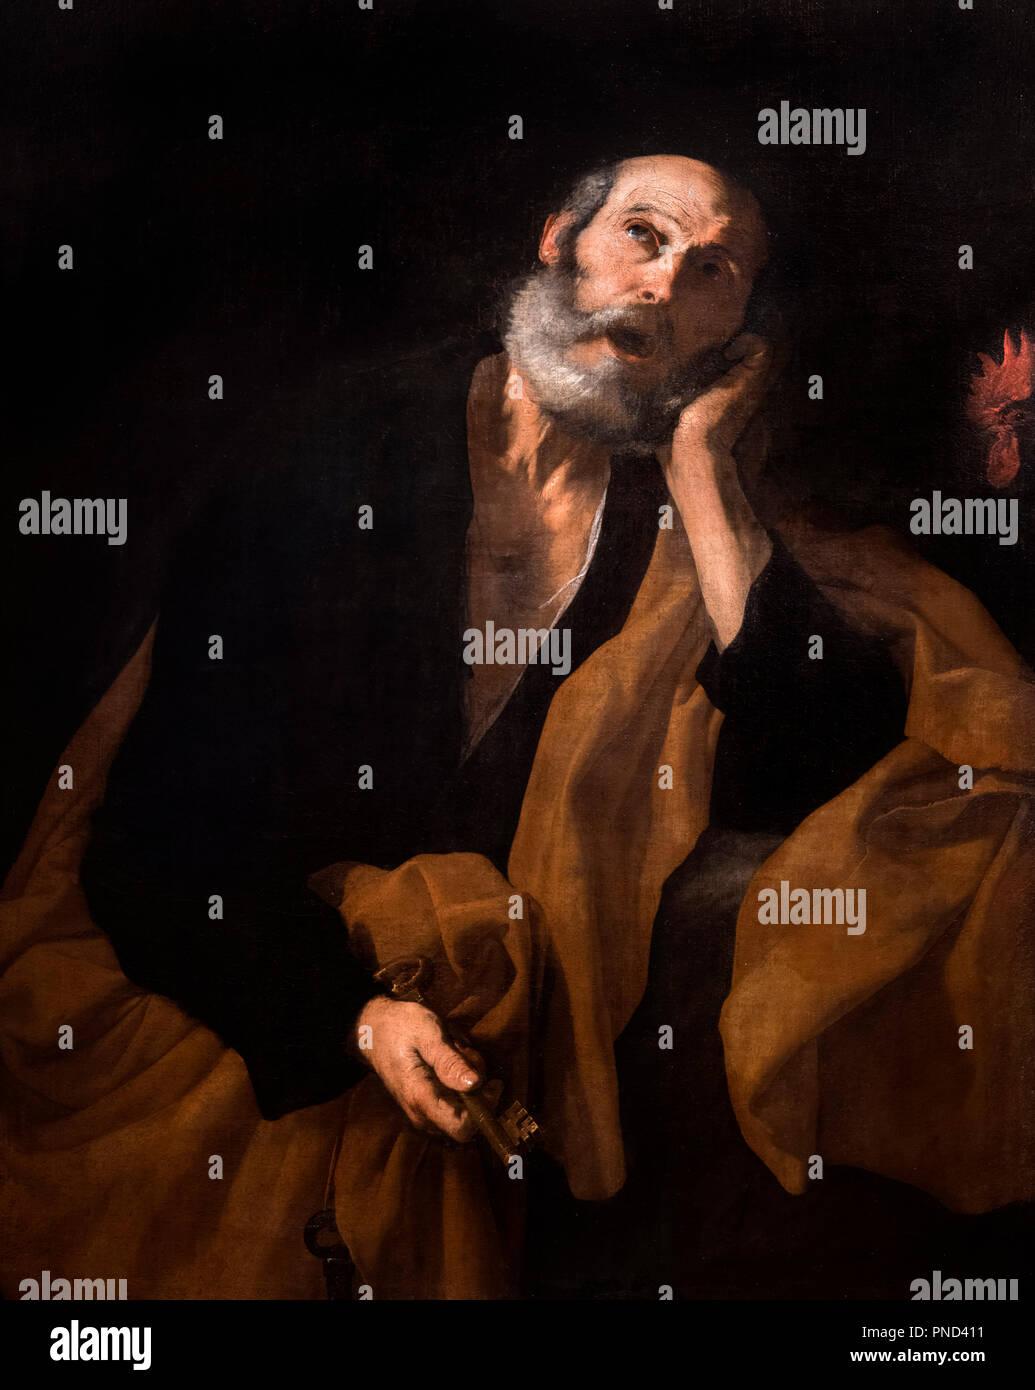 The Denial of St Peter by the workshop of Jusepe de Ribera (Jose de Ribera c.1588/91- 1652/6), oil on canvas, c.1640-50 - Stock Image